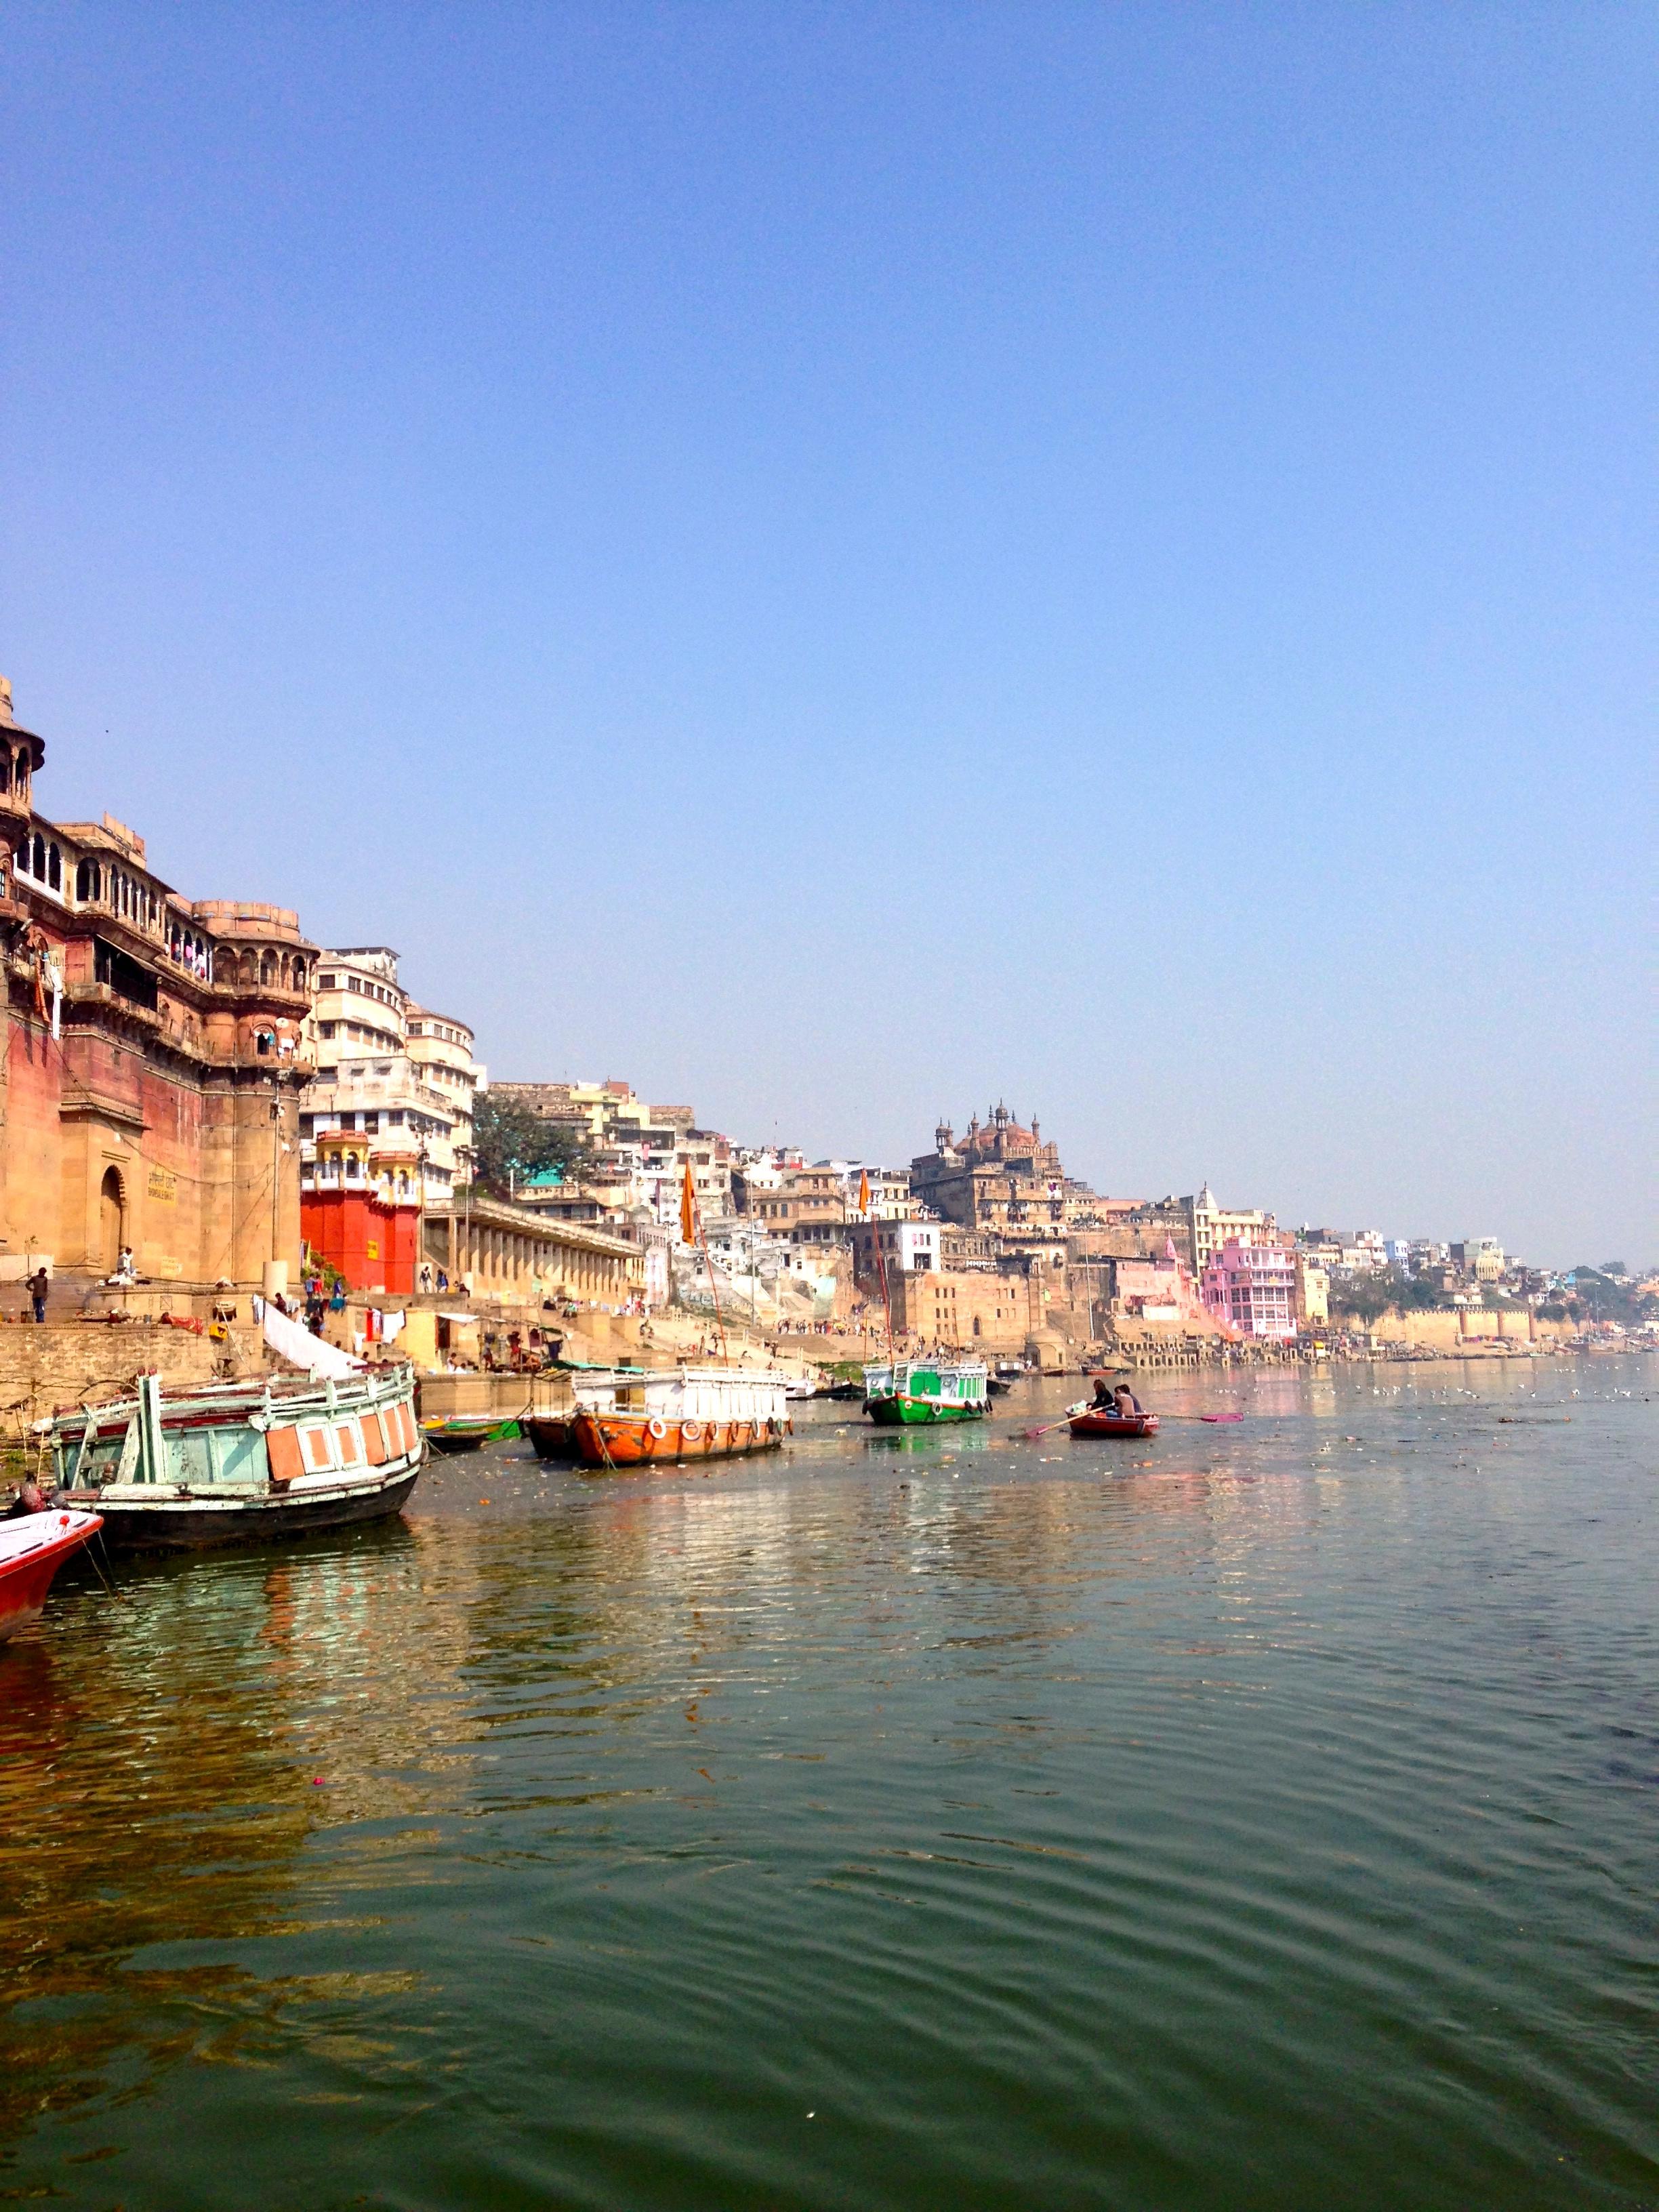 Along the Ganges River